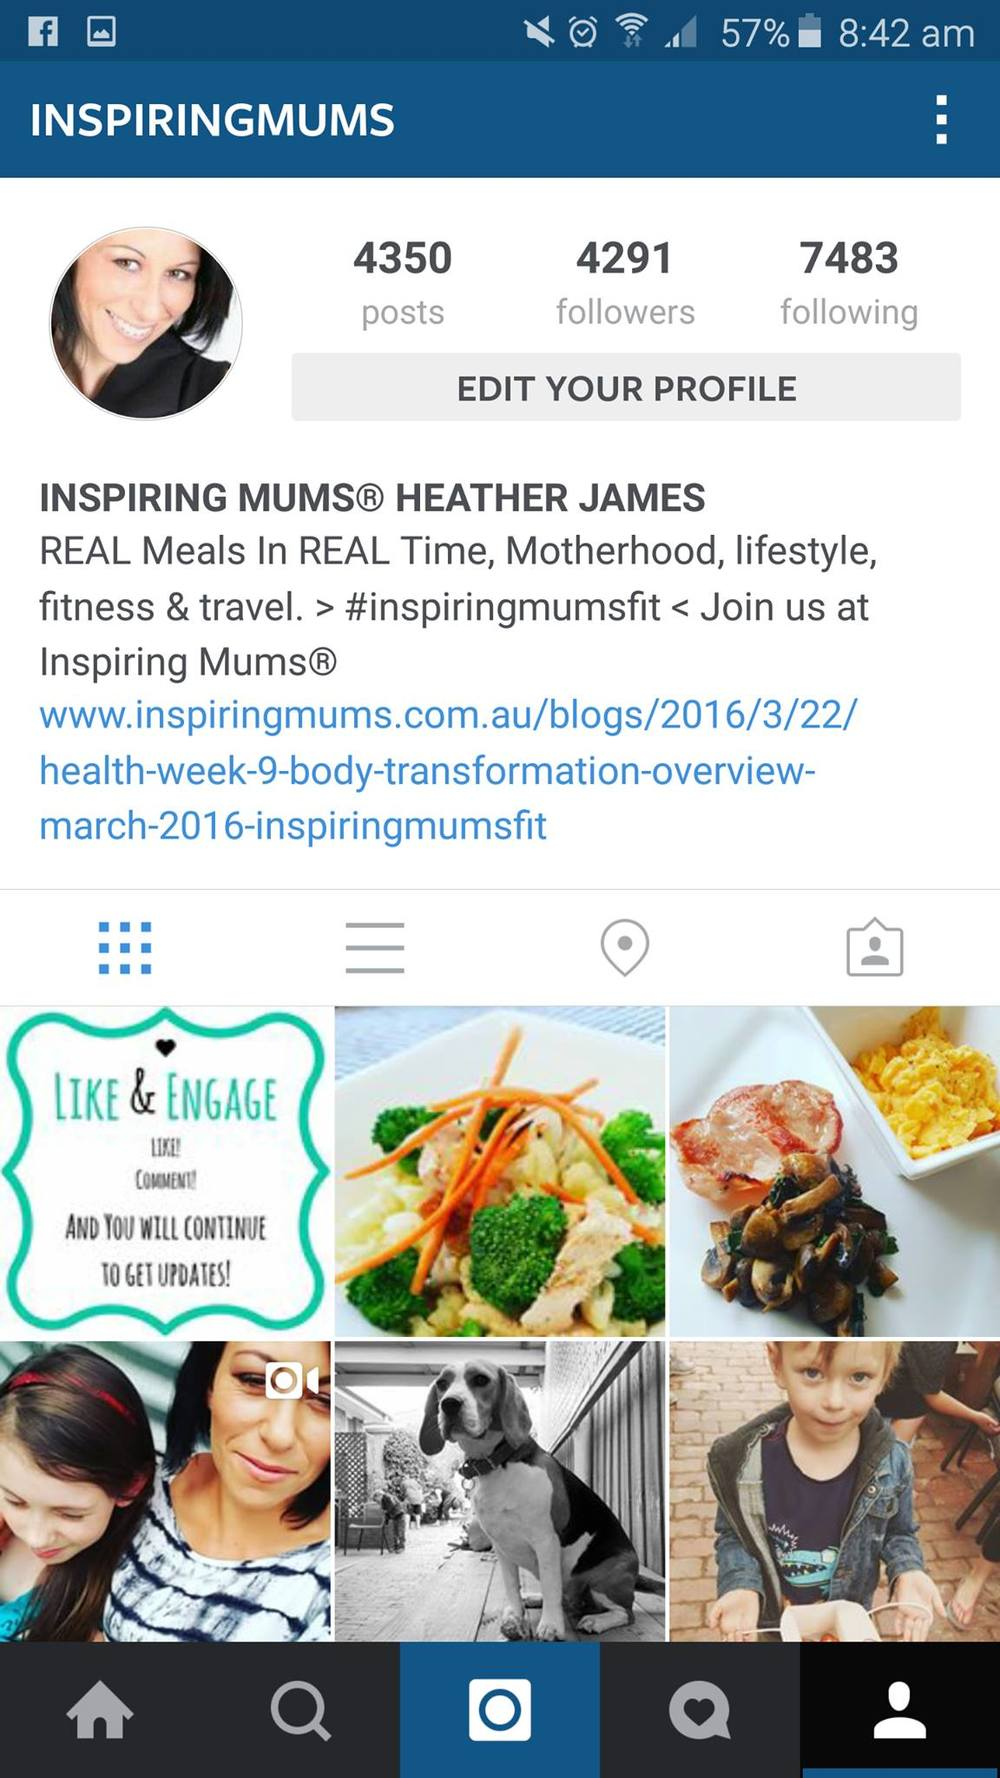 https://www.instagram.com/inspiringmums/| @inspiringmums| #inspiringmums | #inspiringmumsfit